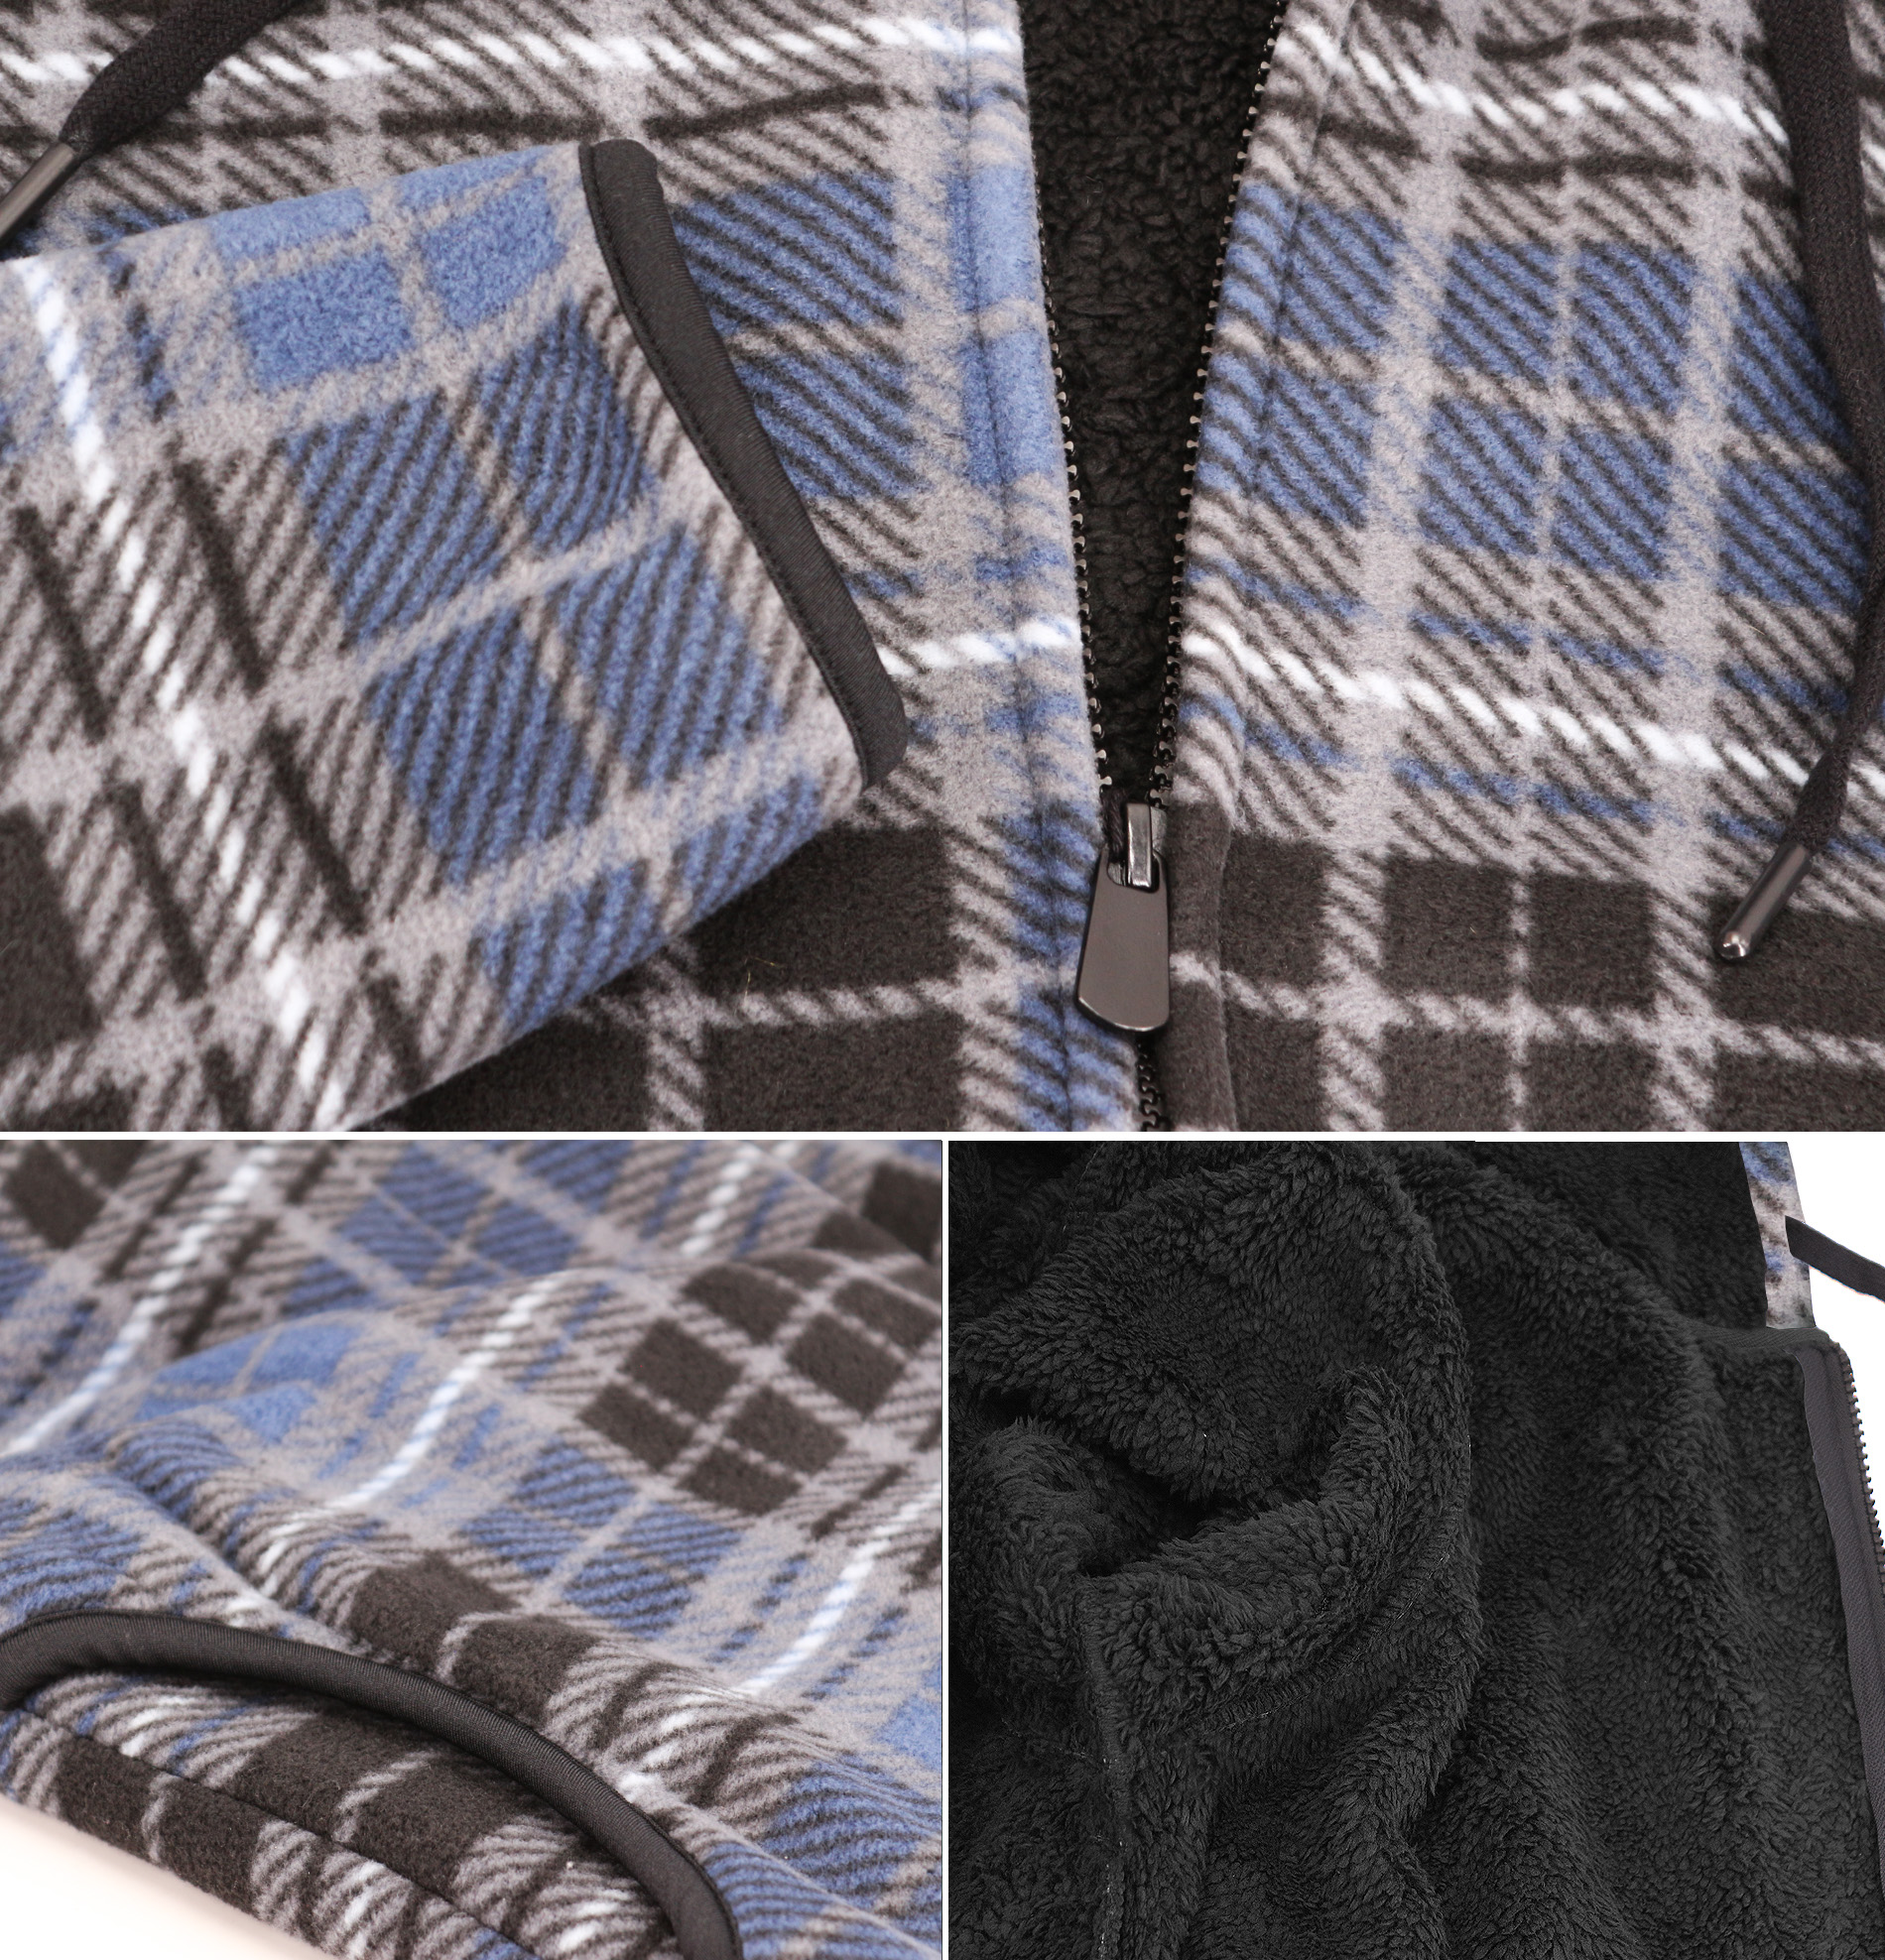 thumbnail 10 - Men-039-s-Casual-Flannel-Zip-Up-Fleece-Lined-Plaid-Sherpa-Hoodie-Lightweight-Jacket